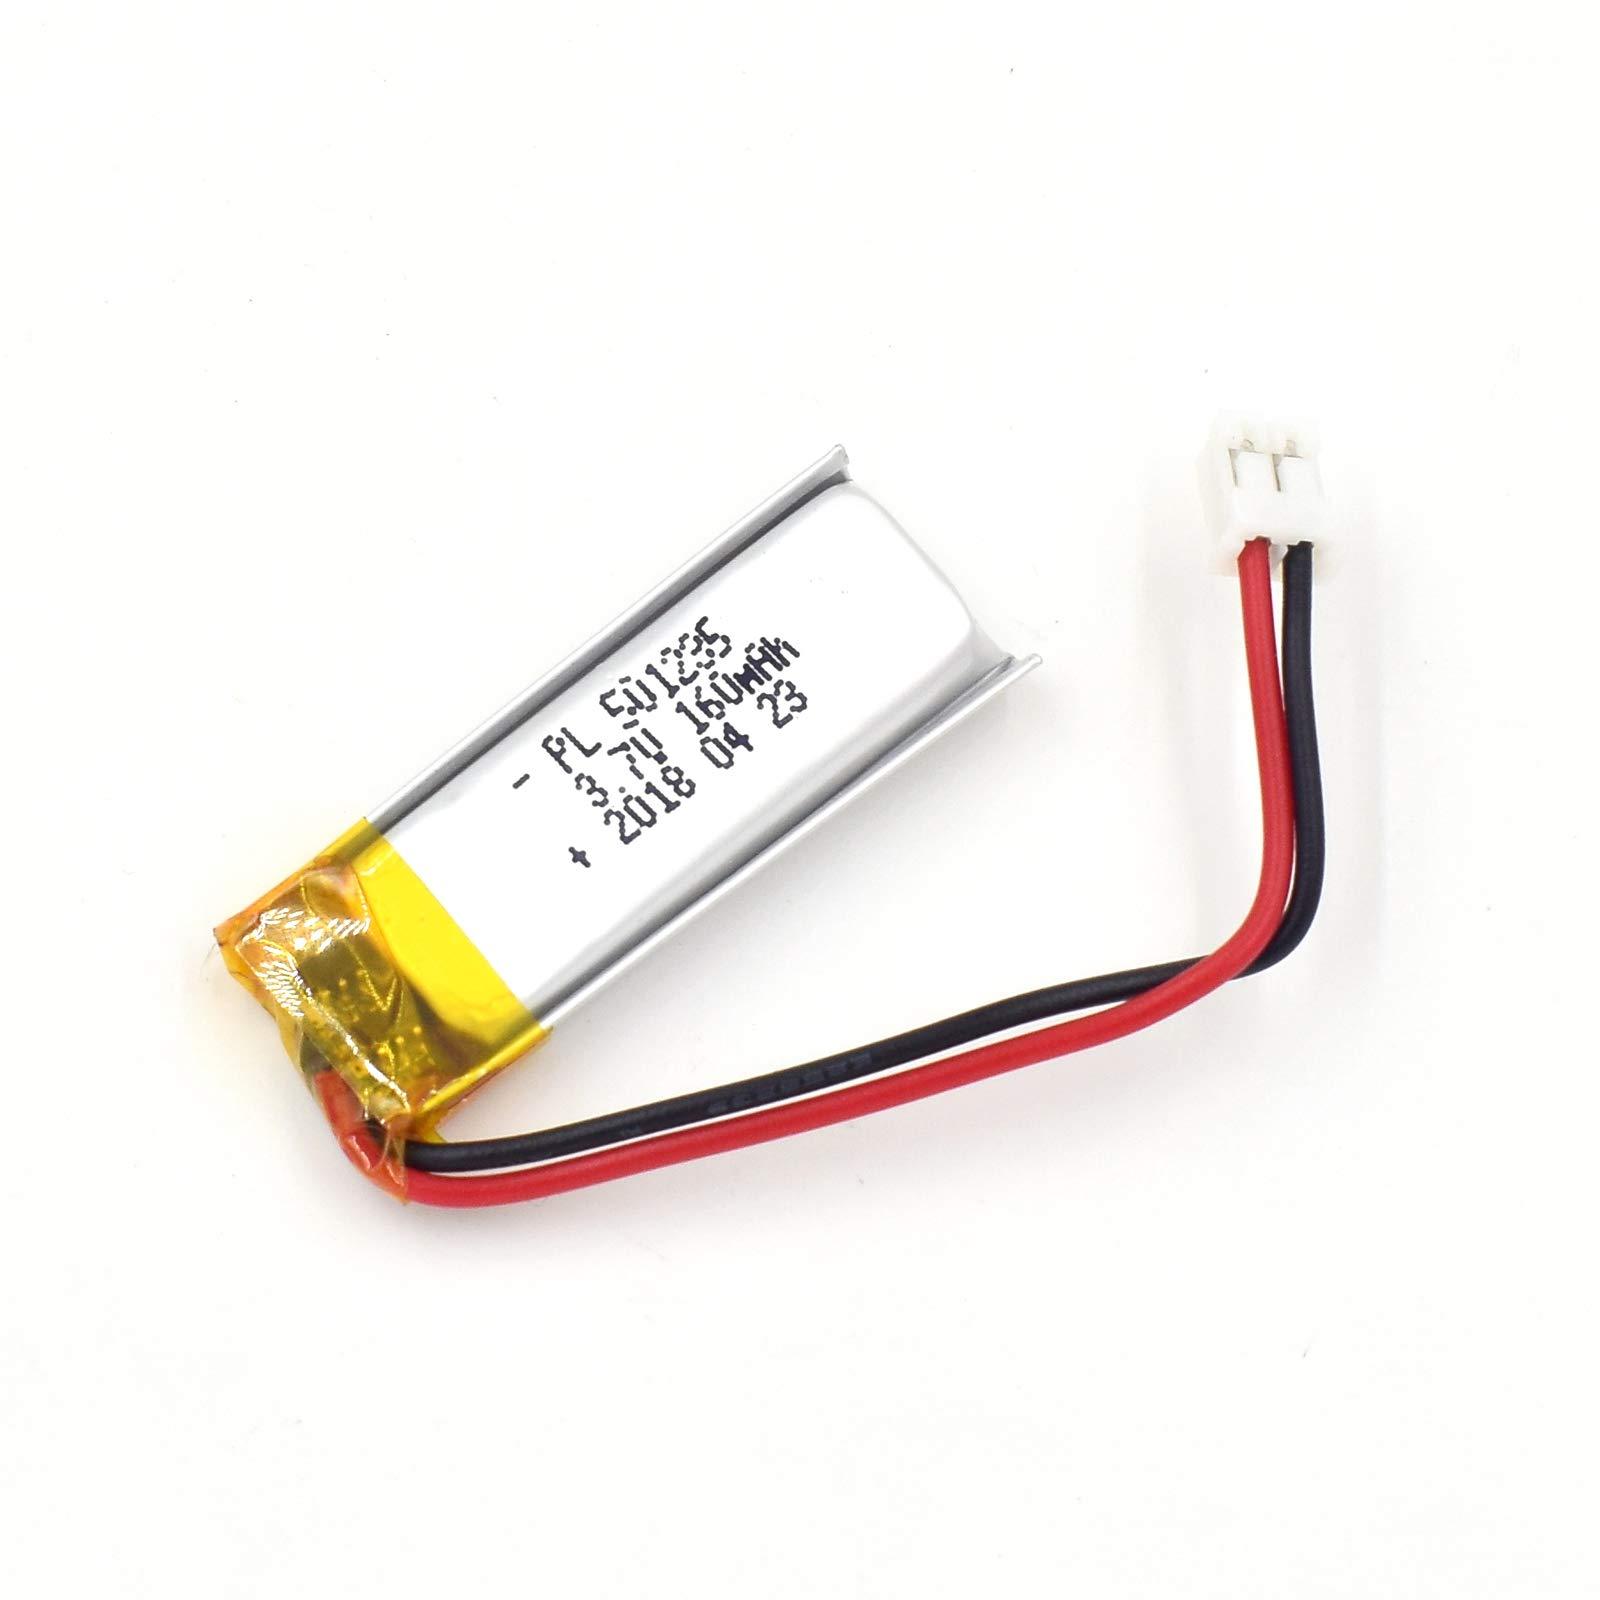 Bateria Lipo 3.7V 160mAh 501235 Recargable JST Conector